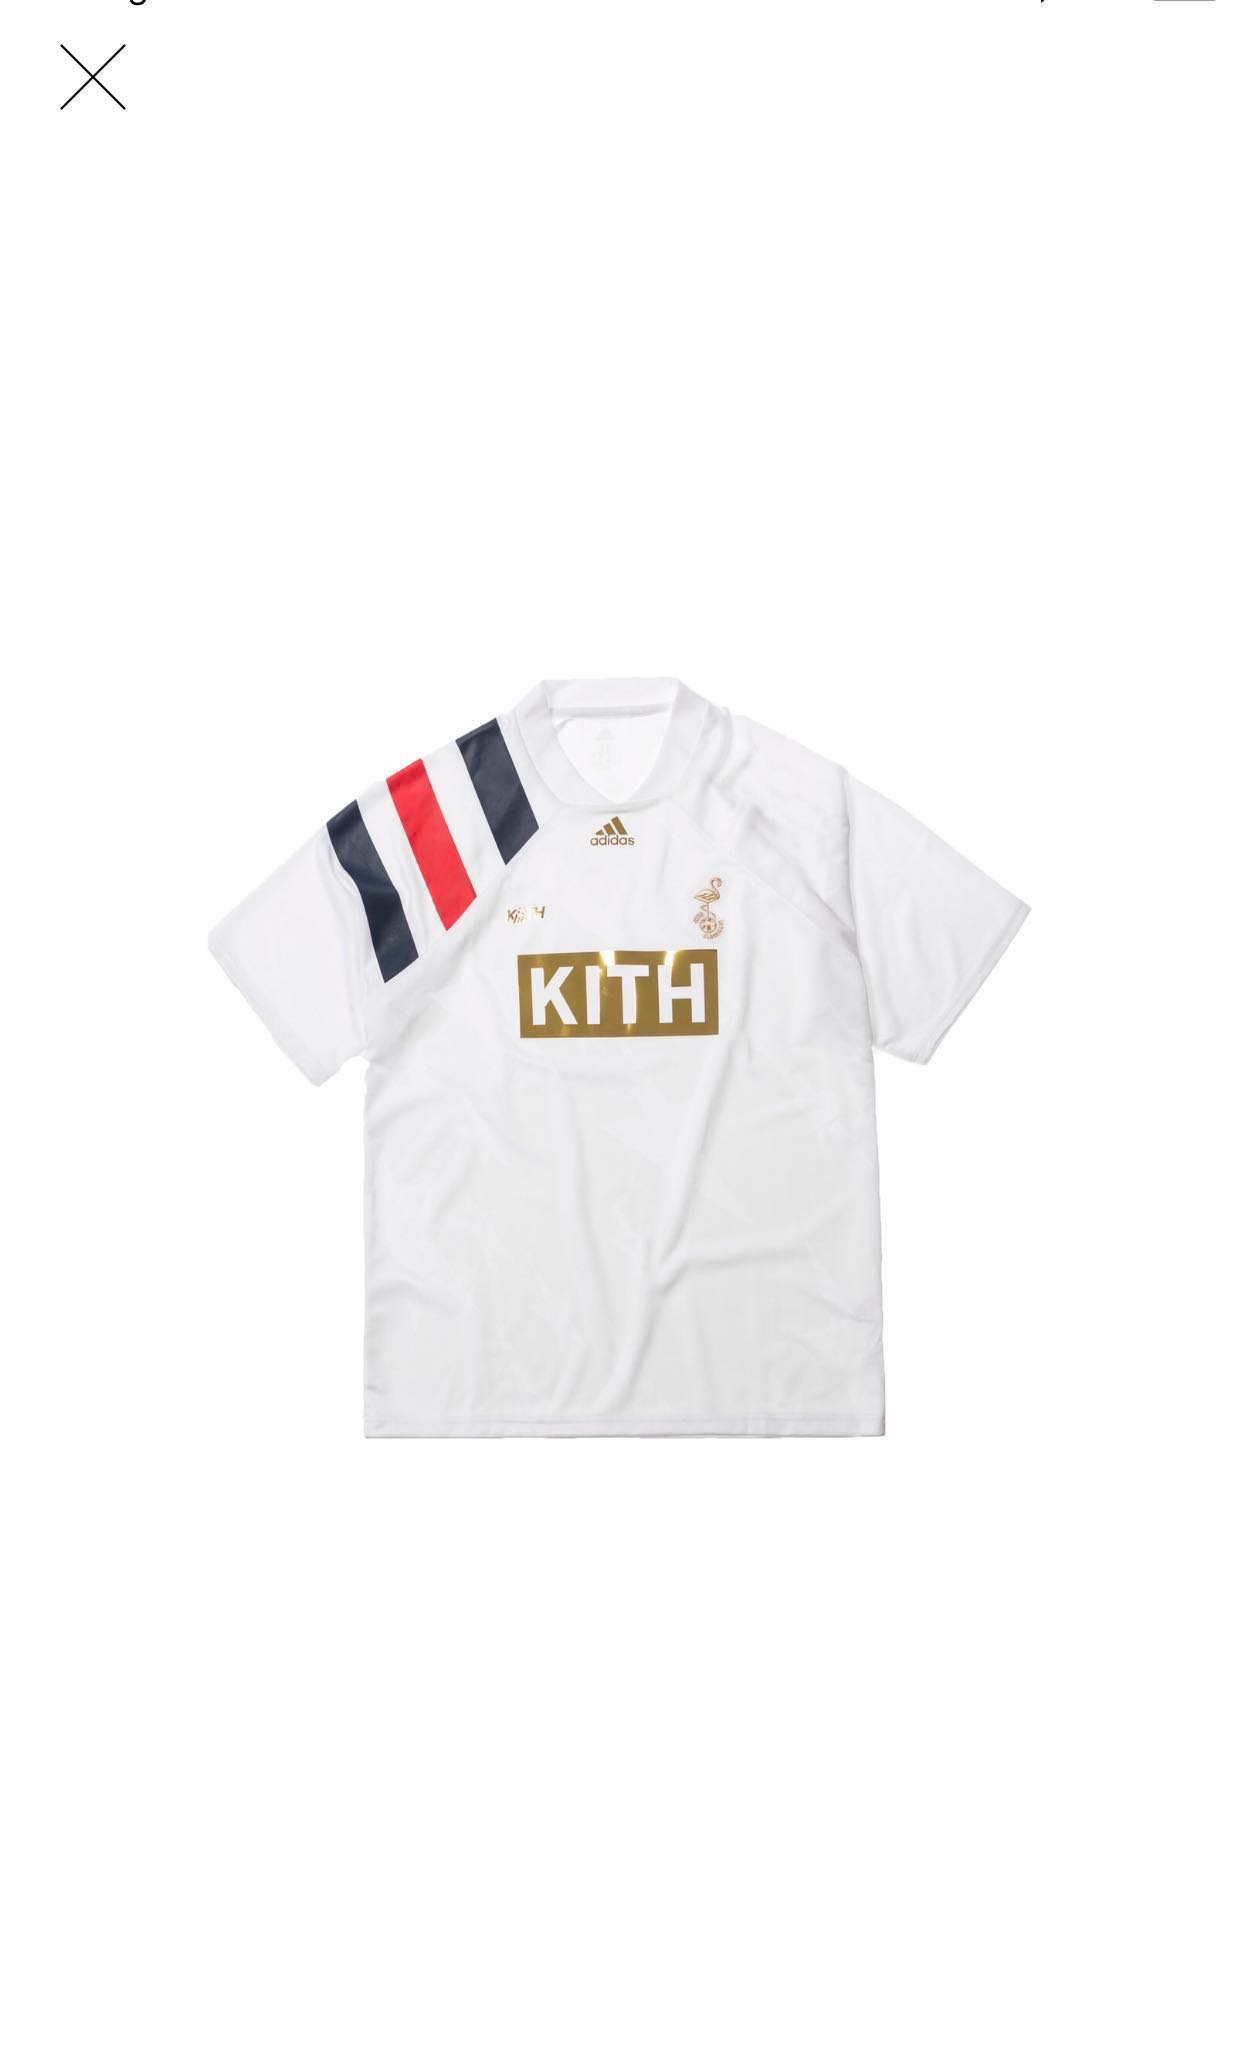 0b2ecb8eece5a Kith Adidas Jersey